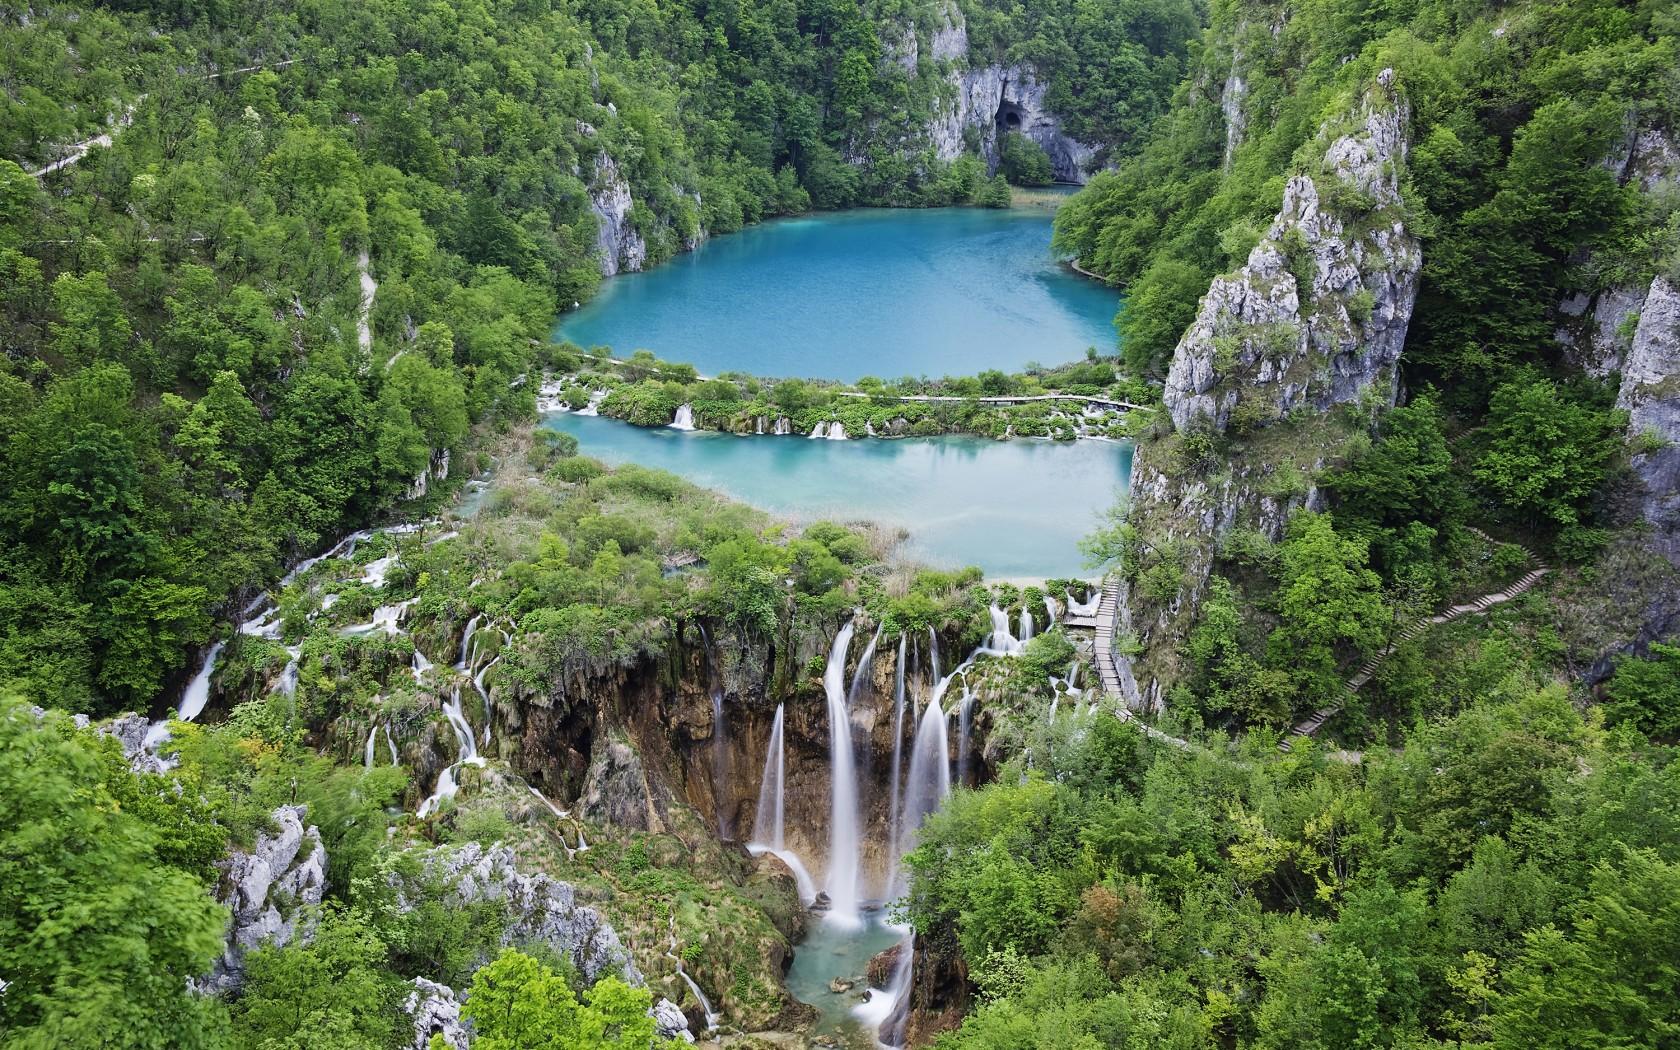 1-Plitvice-Croatia-82643682-1680x1050